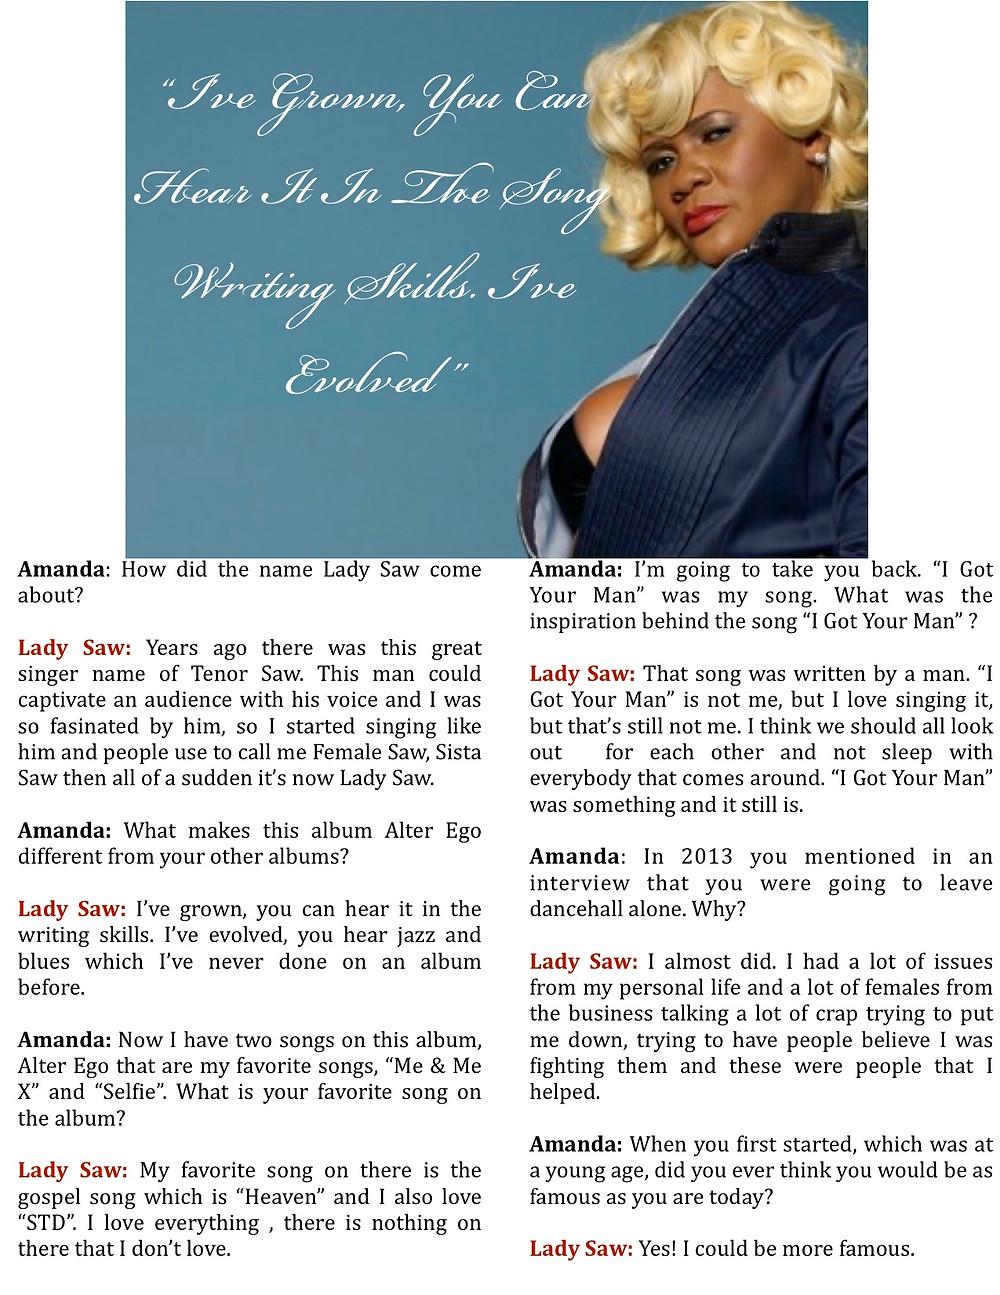 lady saw interview1.jpg